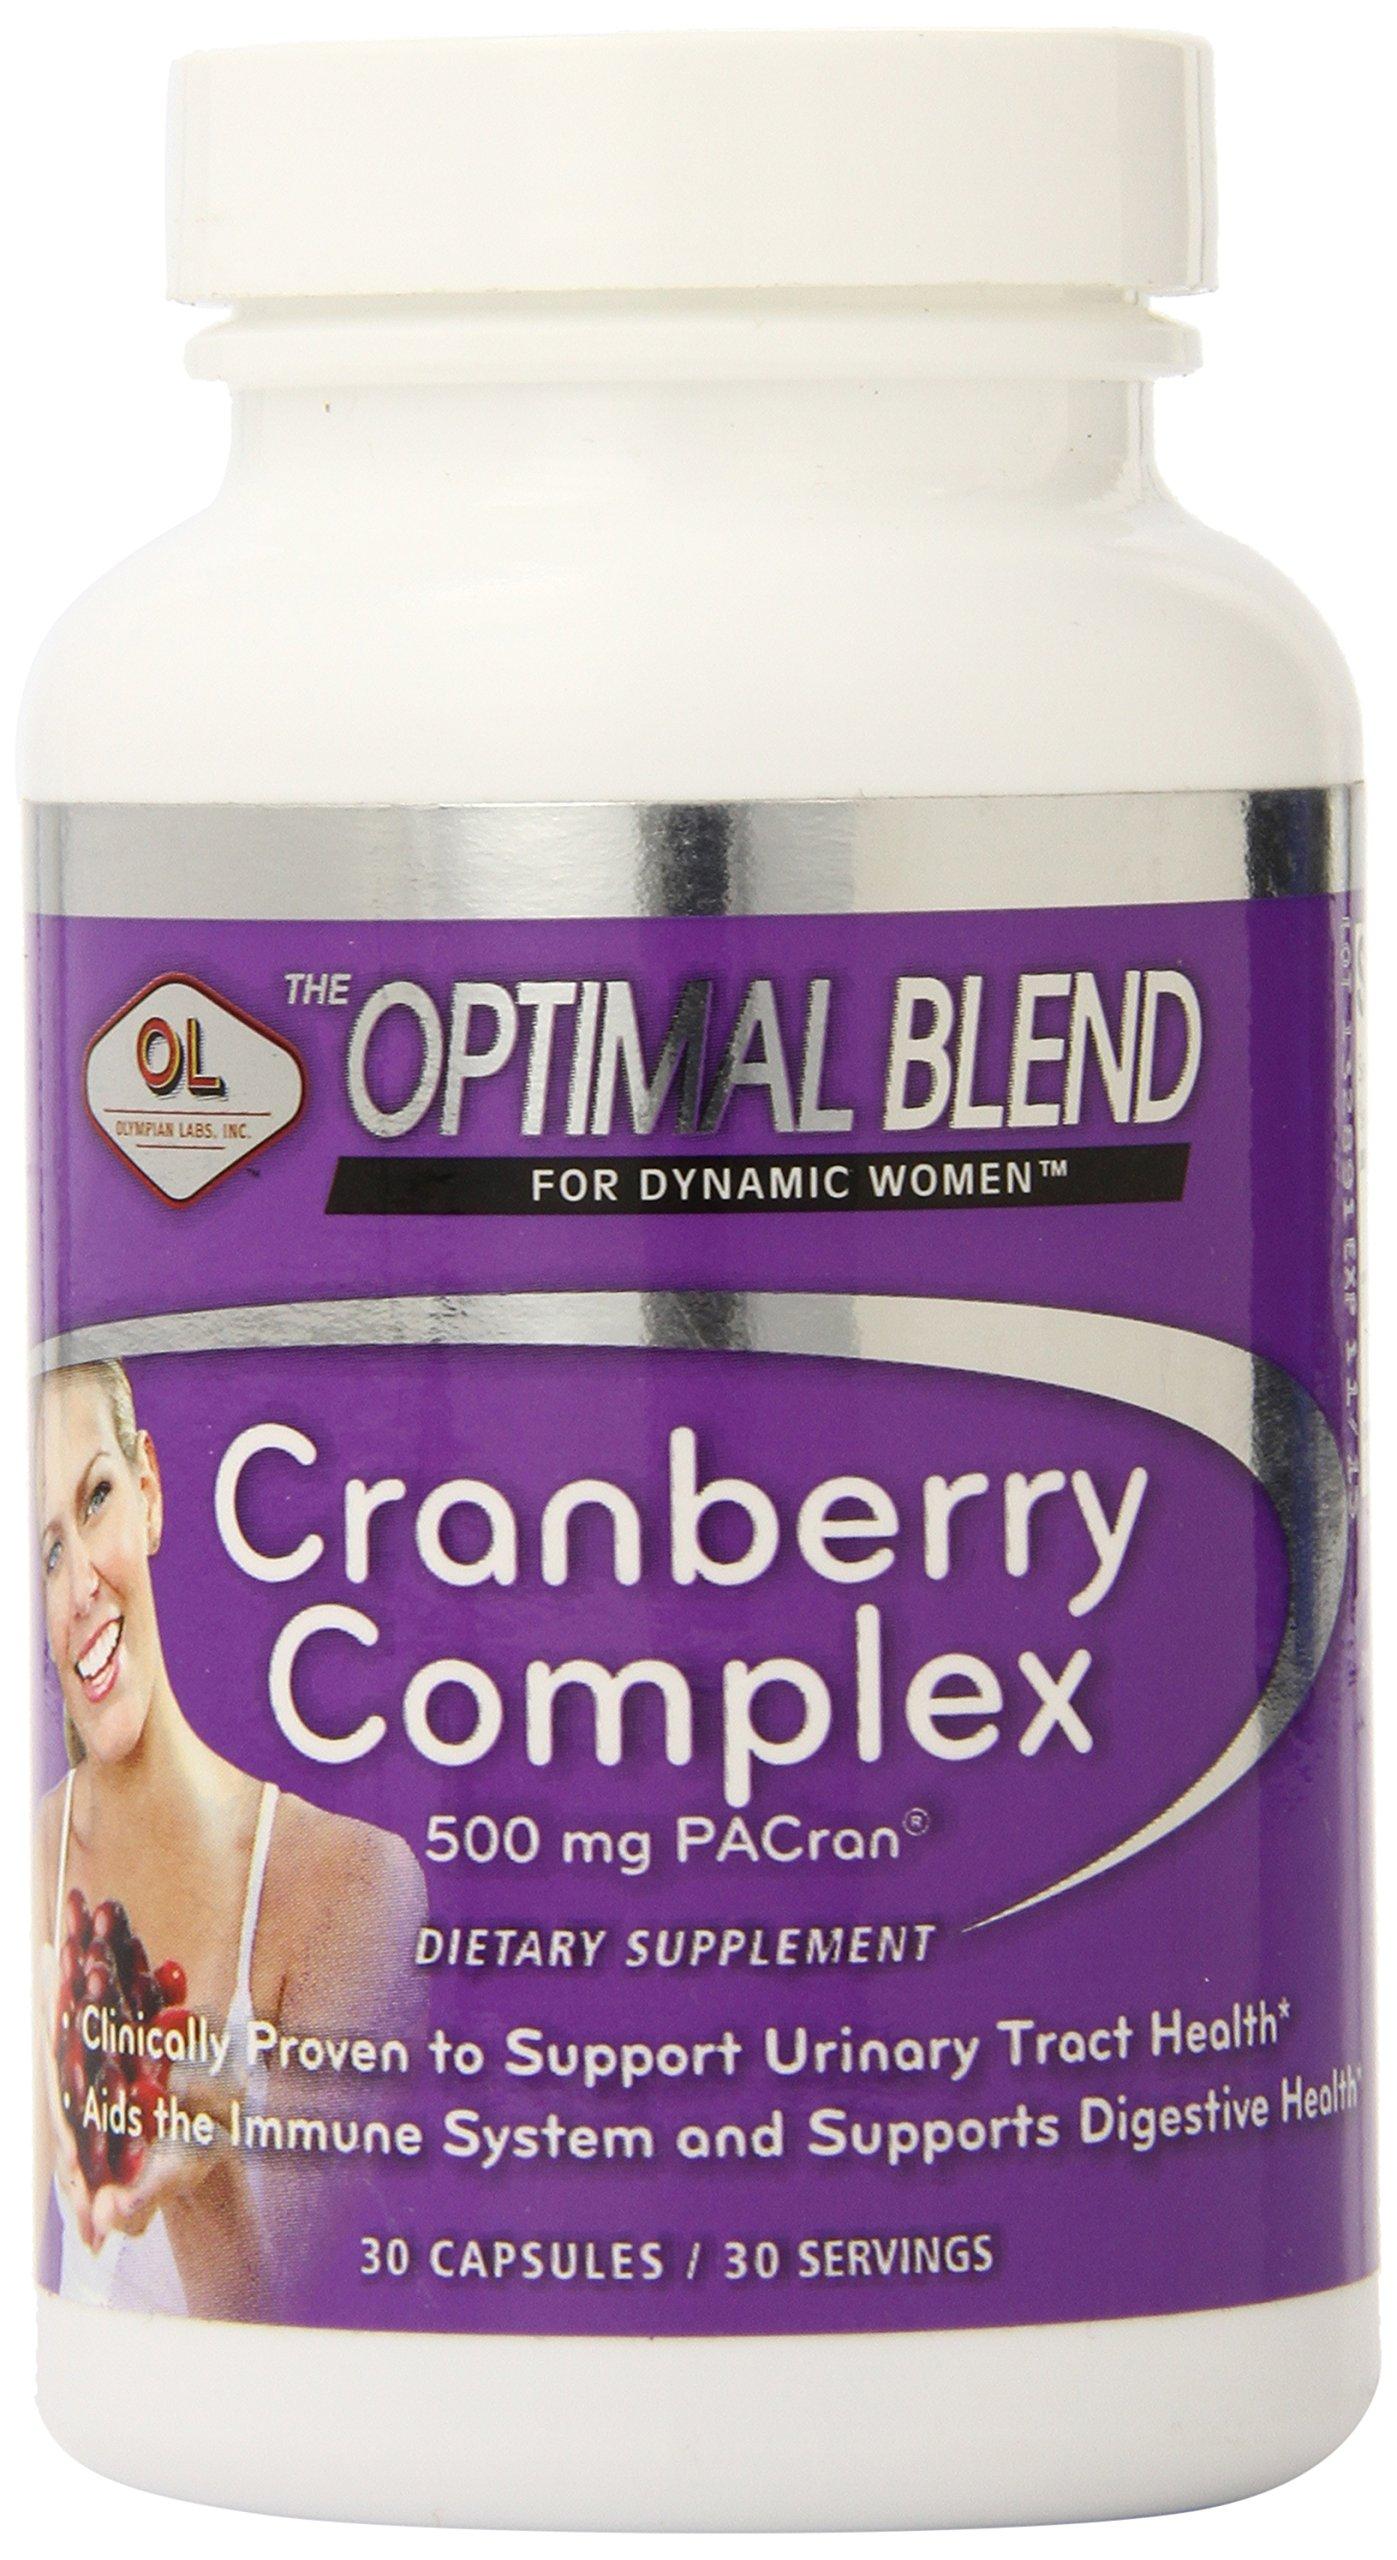 Optimal Blend Cranberry Complex Capsules, 30 Count